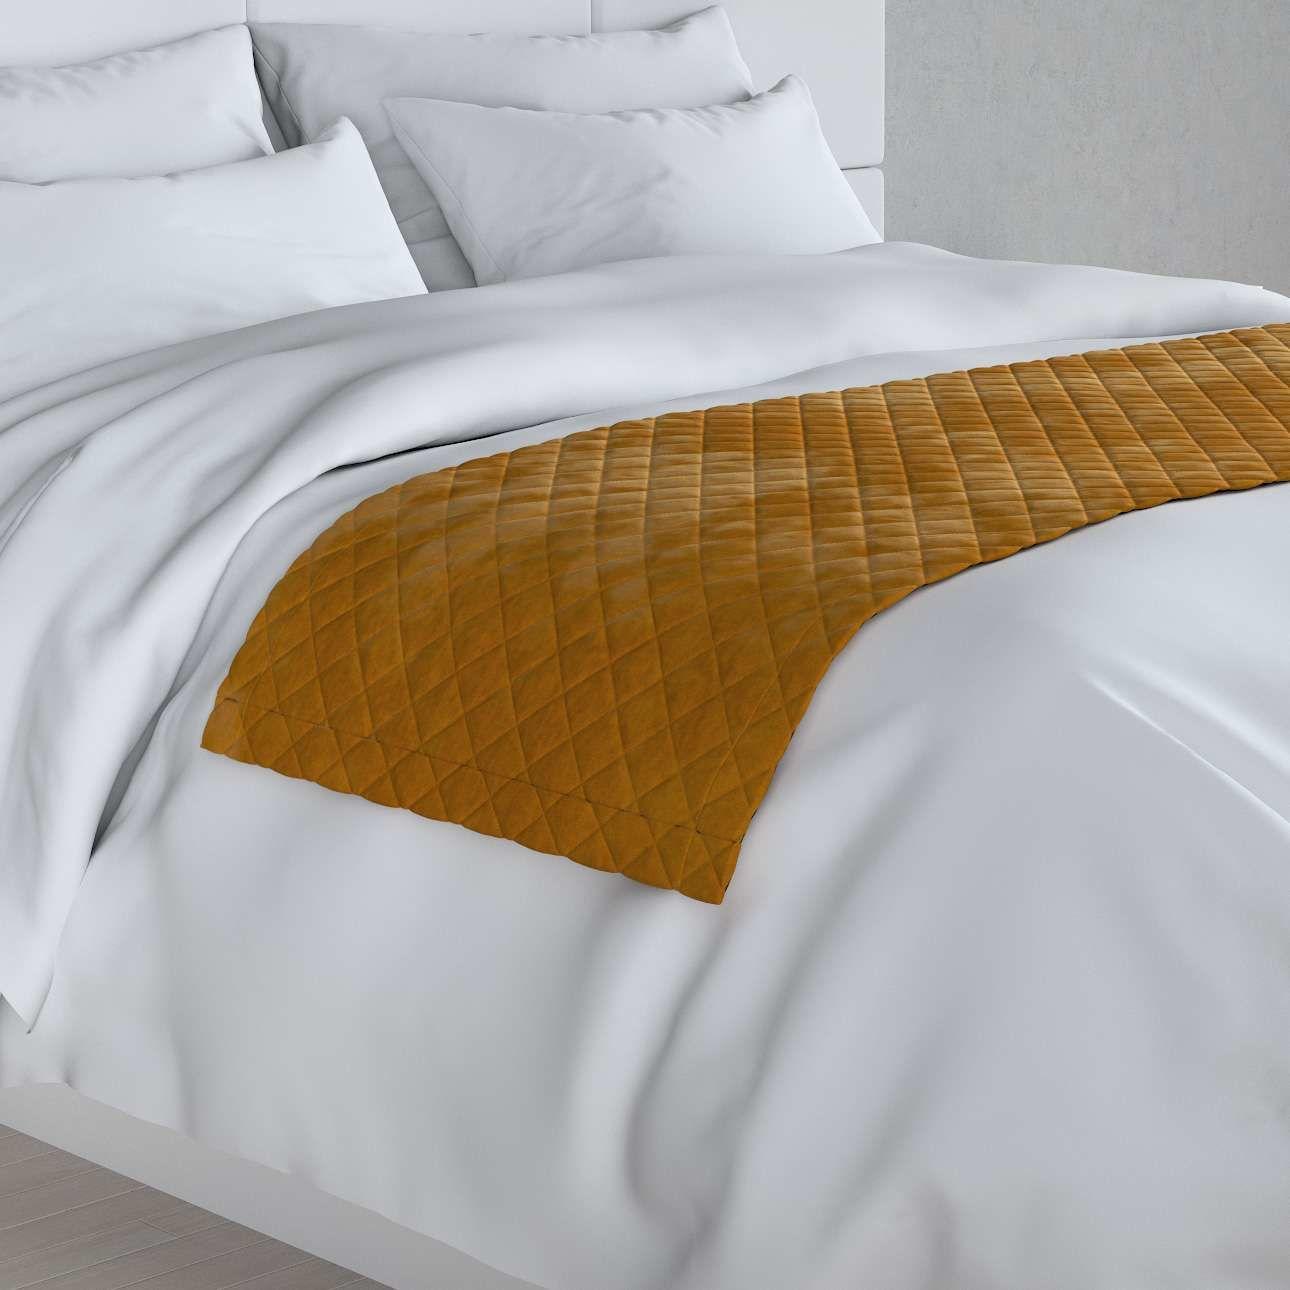 Narzuta hotelowa bieżnik Velvet 60x200cm, miodowy, 60 x 200 cm, Velvet